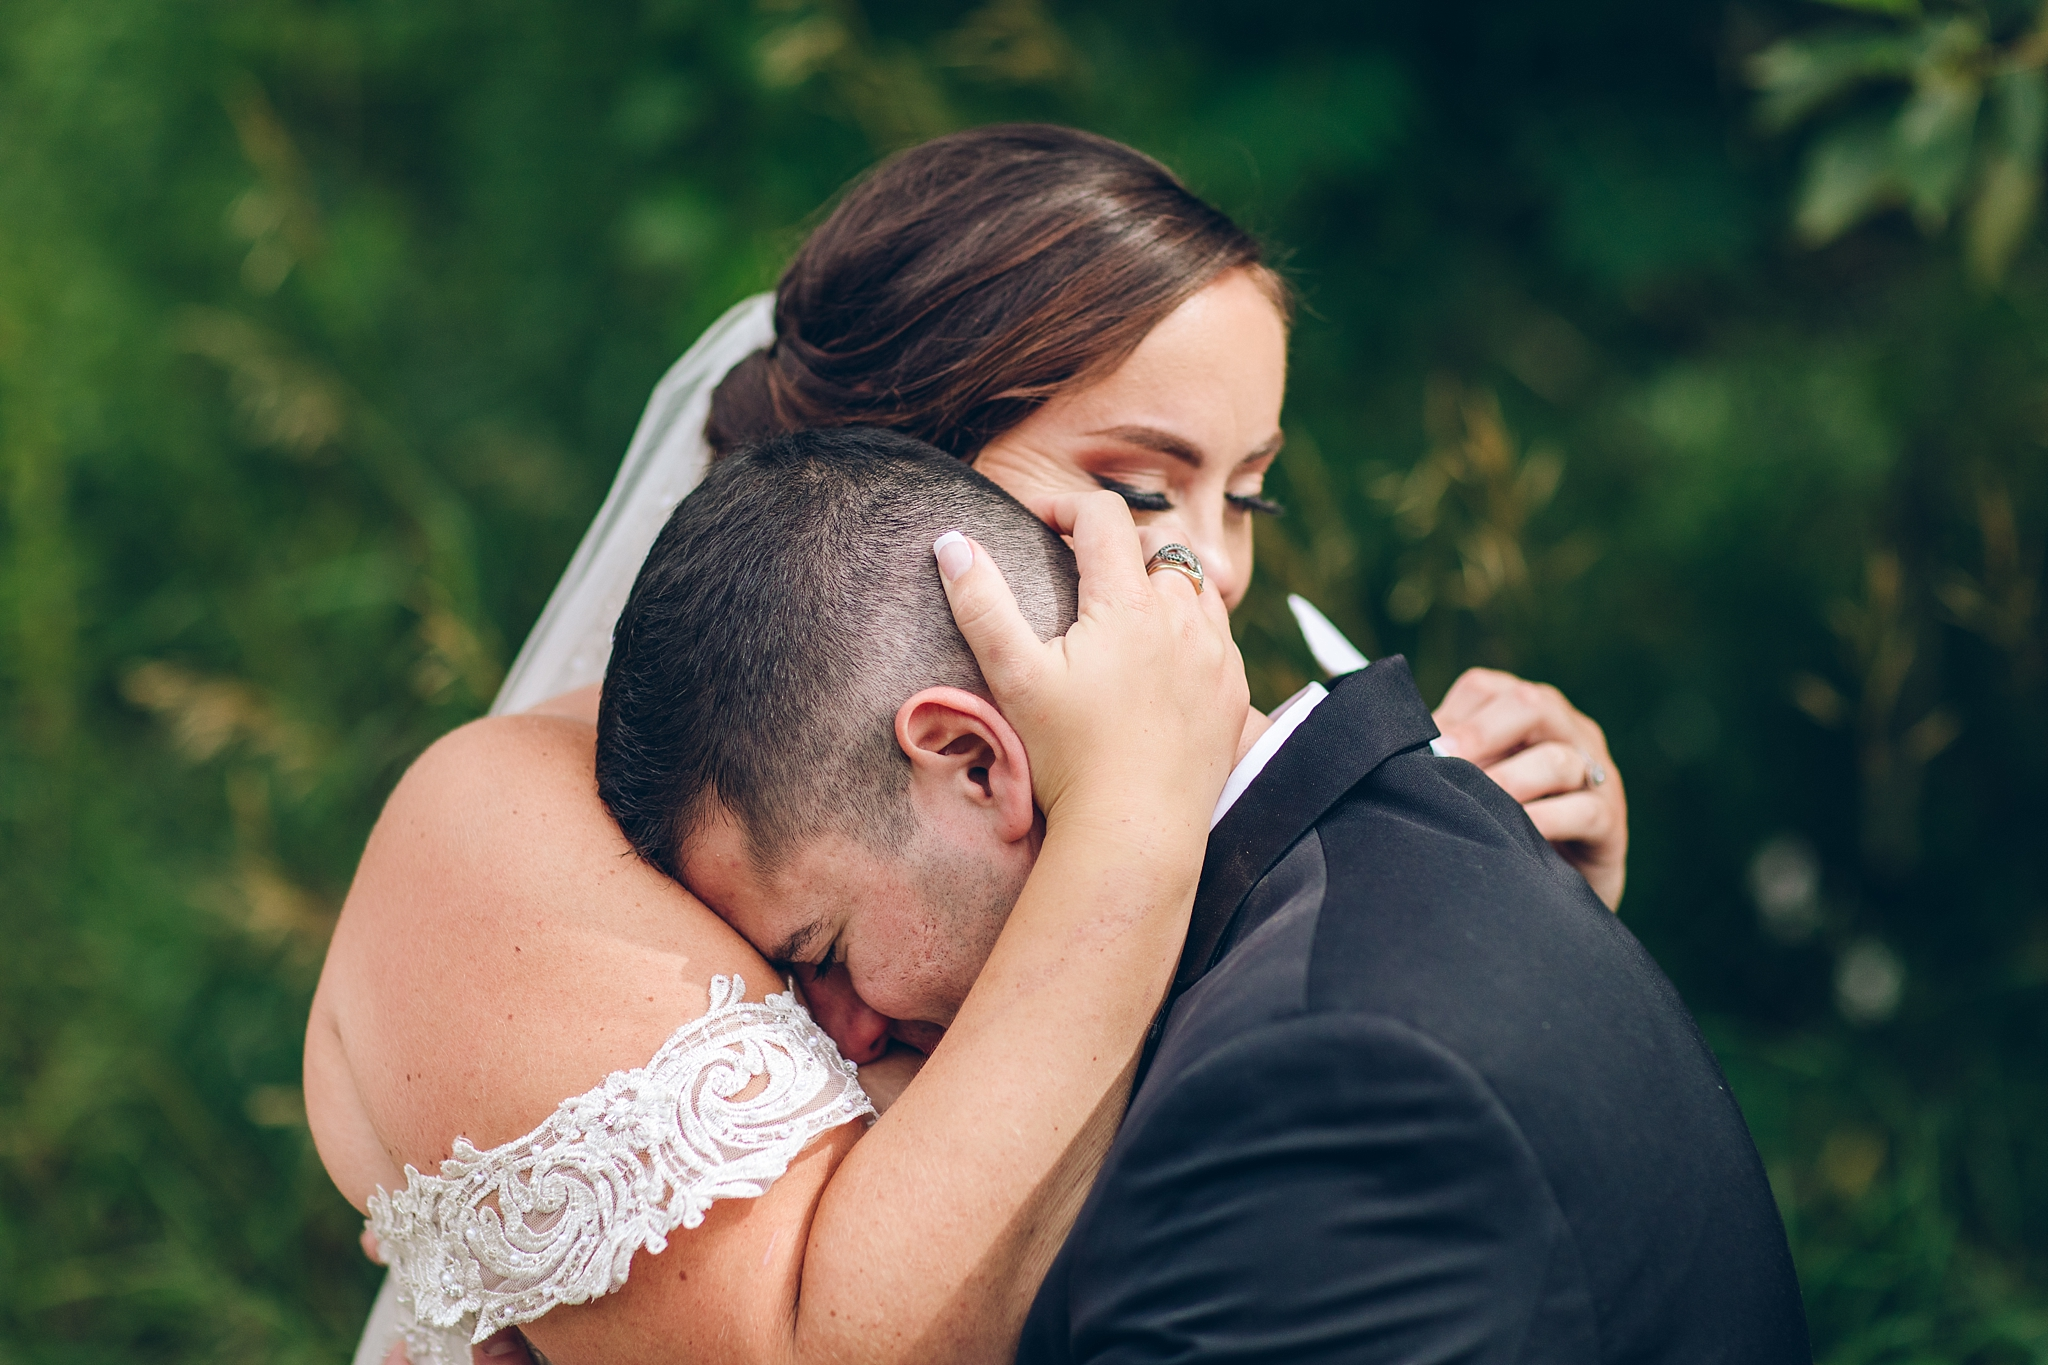 baker-lofts-holland-michigan-wedding-photographer_0337.jpg